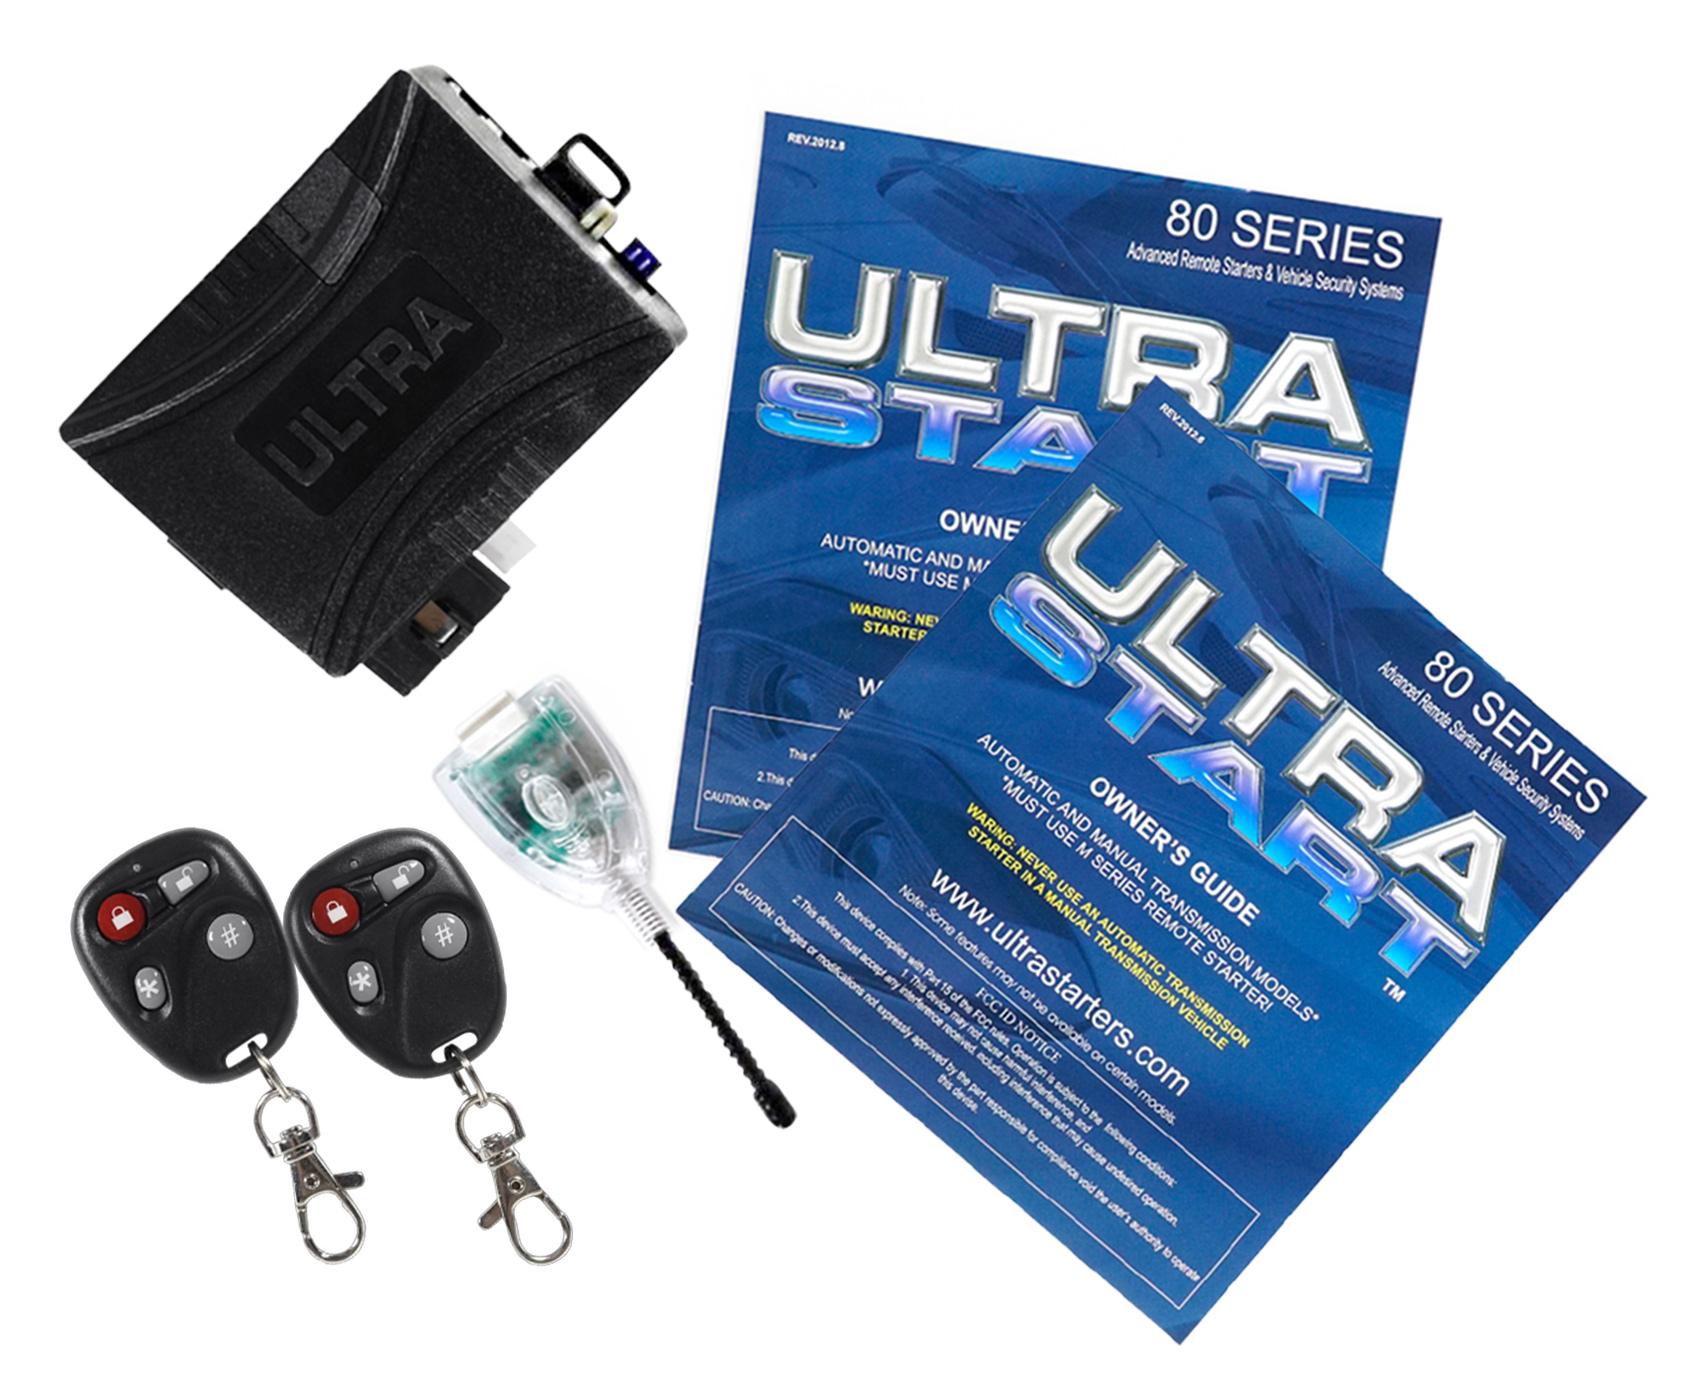 ultrastart u1280 dp 2800 ft foot car remote starter keyless entry